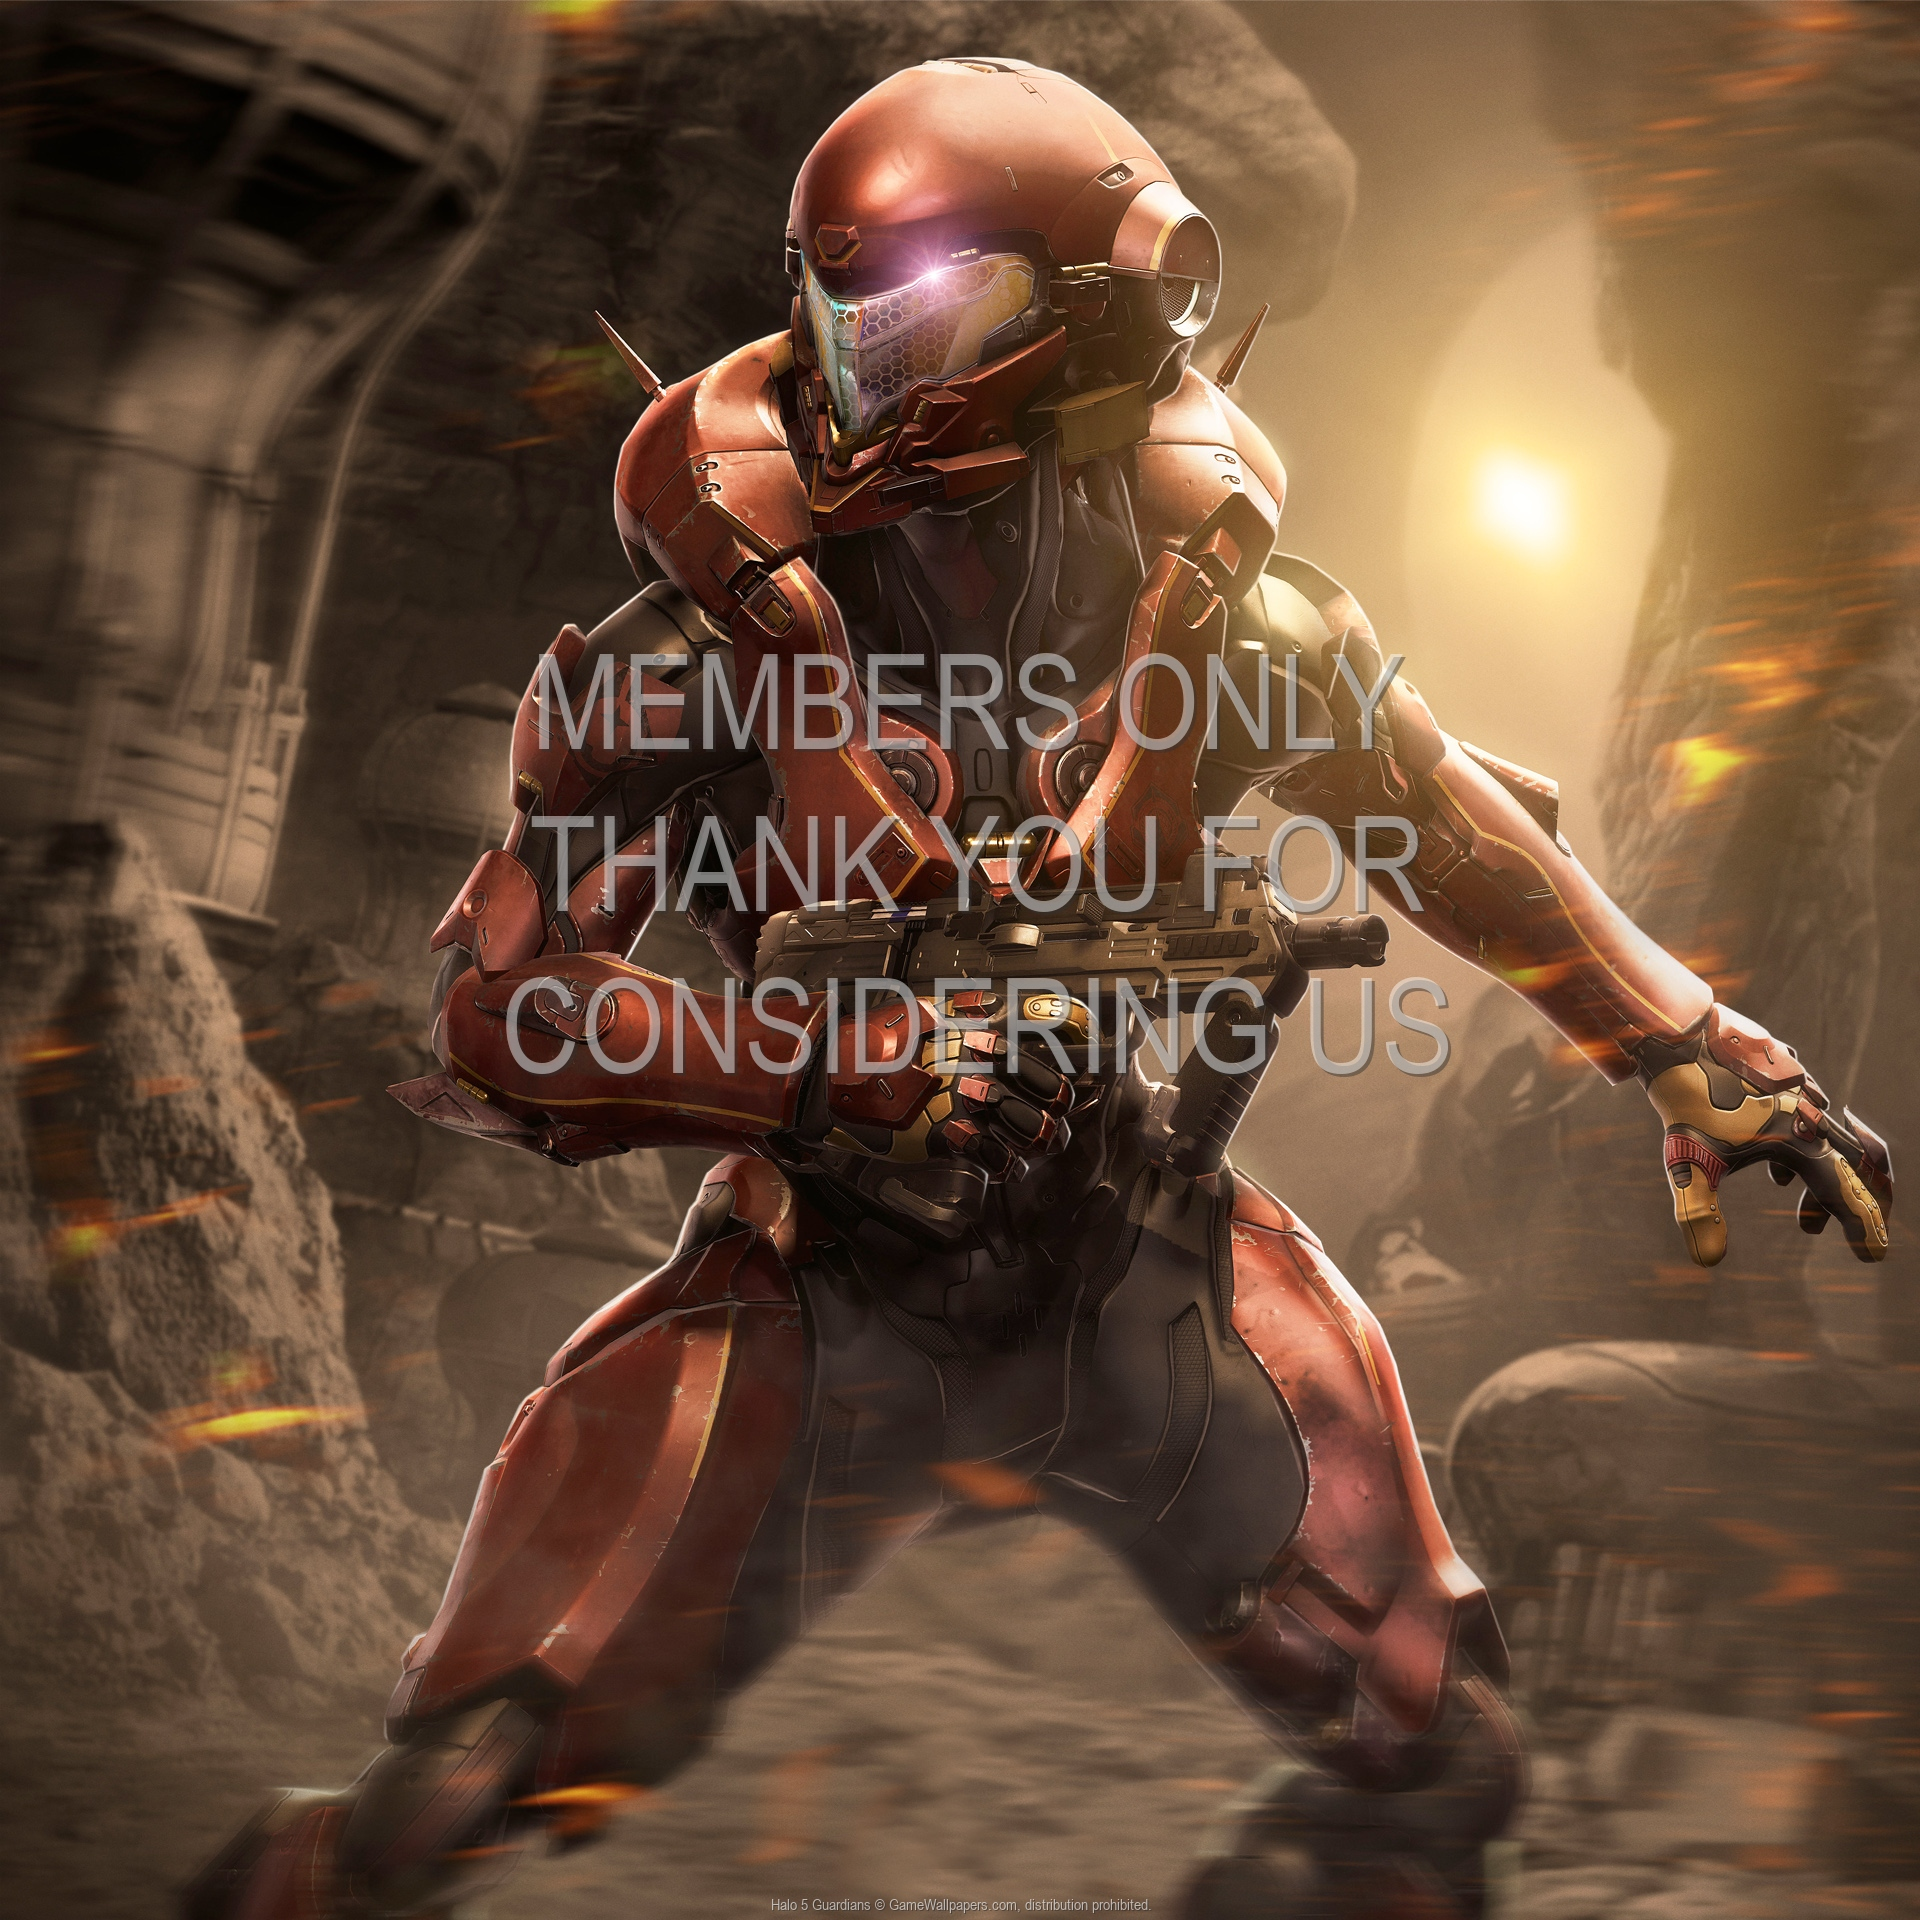 Halo 5: Guardians 1920x1080 Handy Hintergrundbild 03